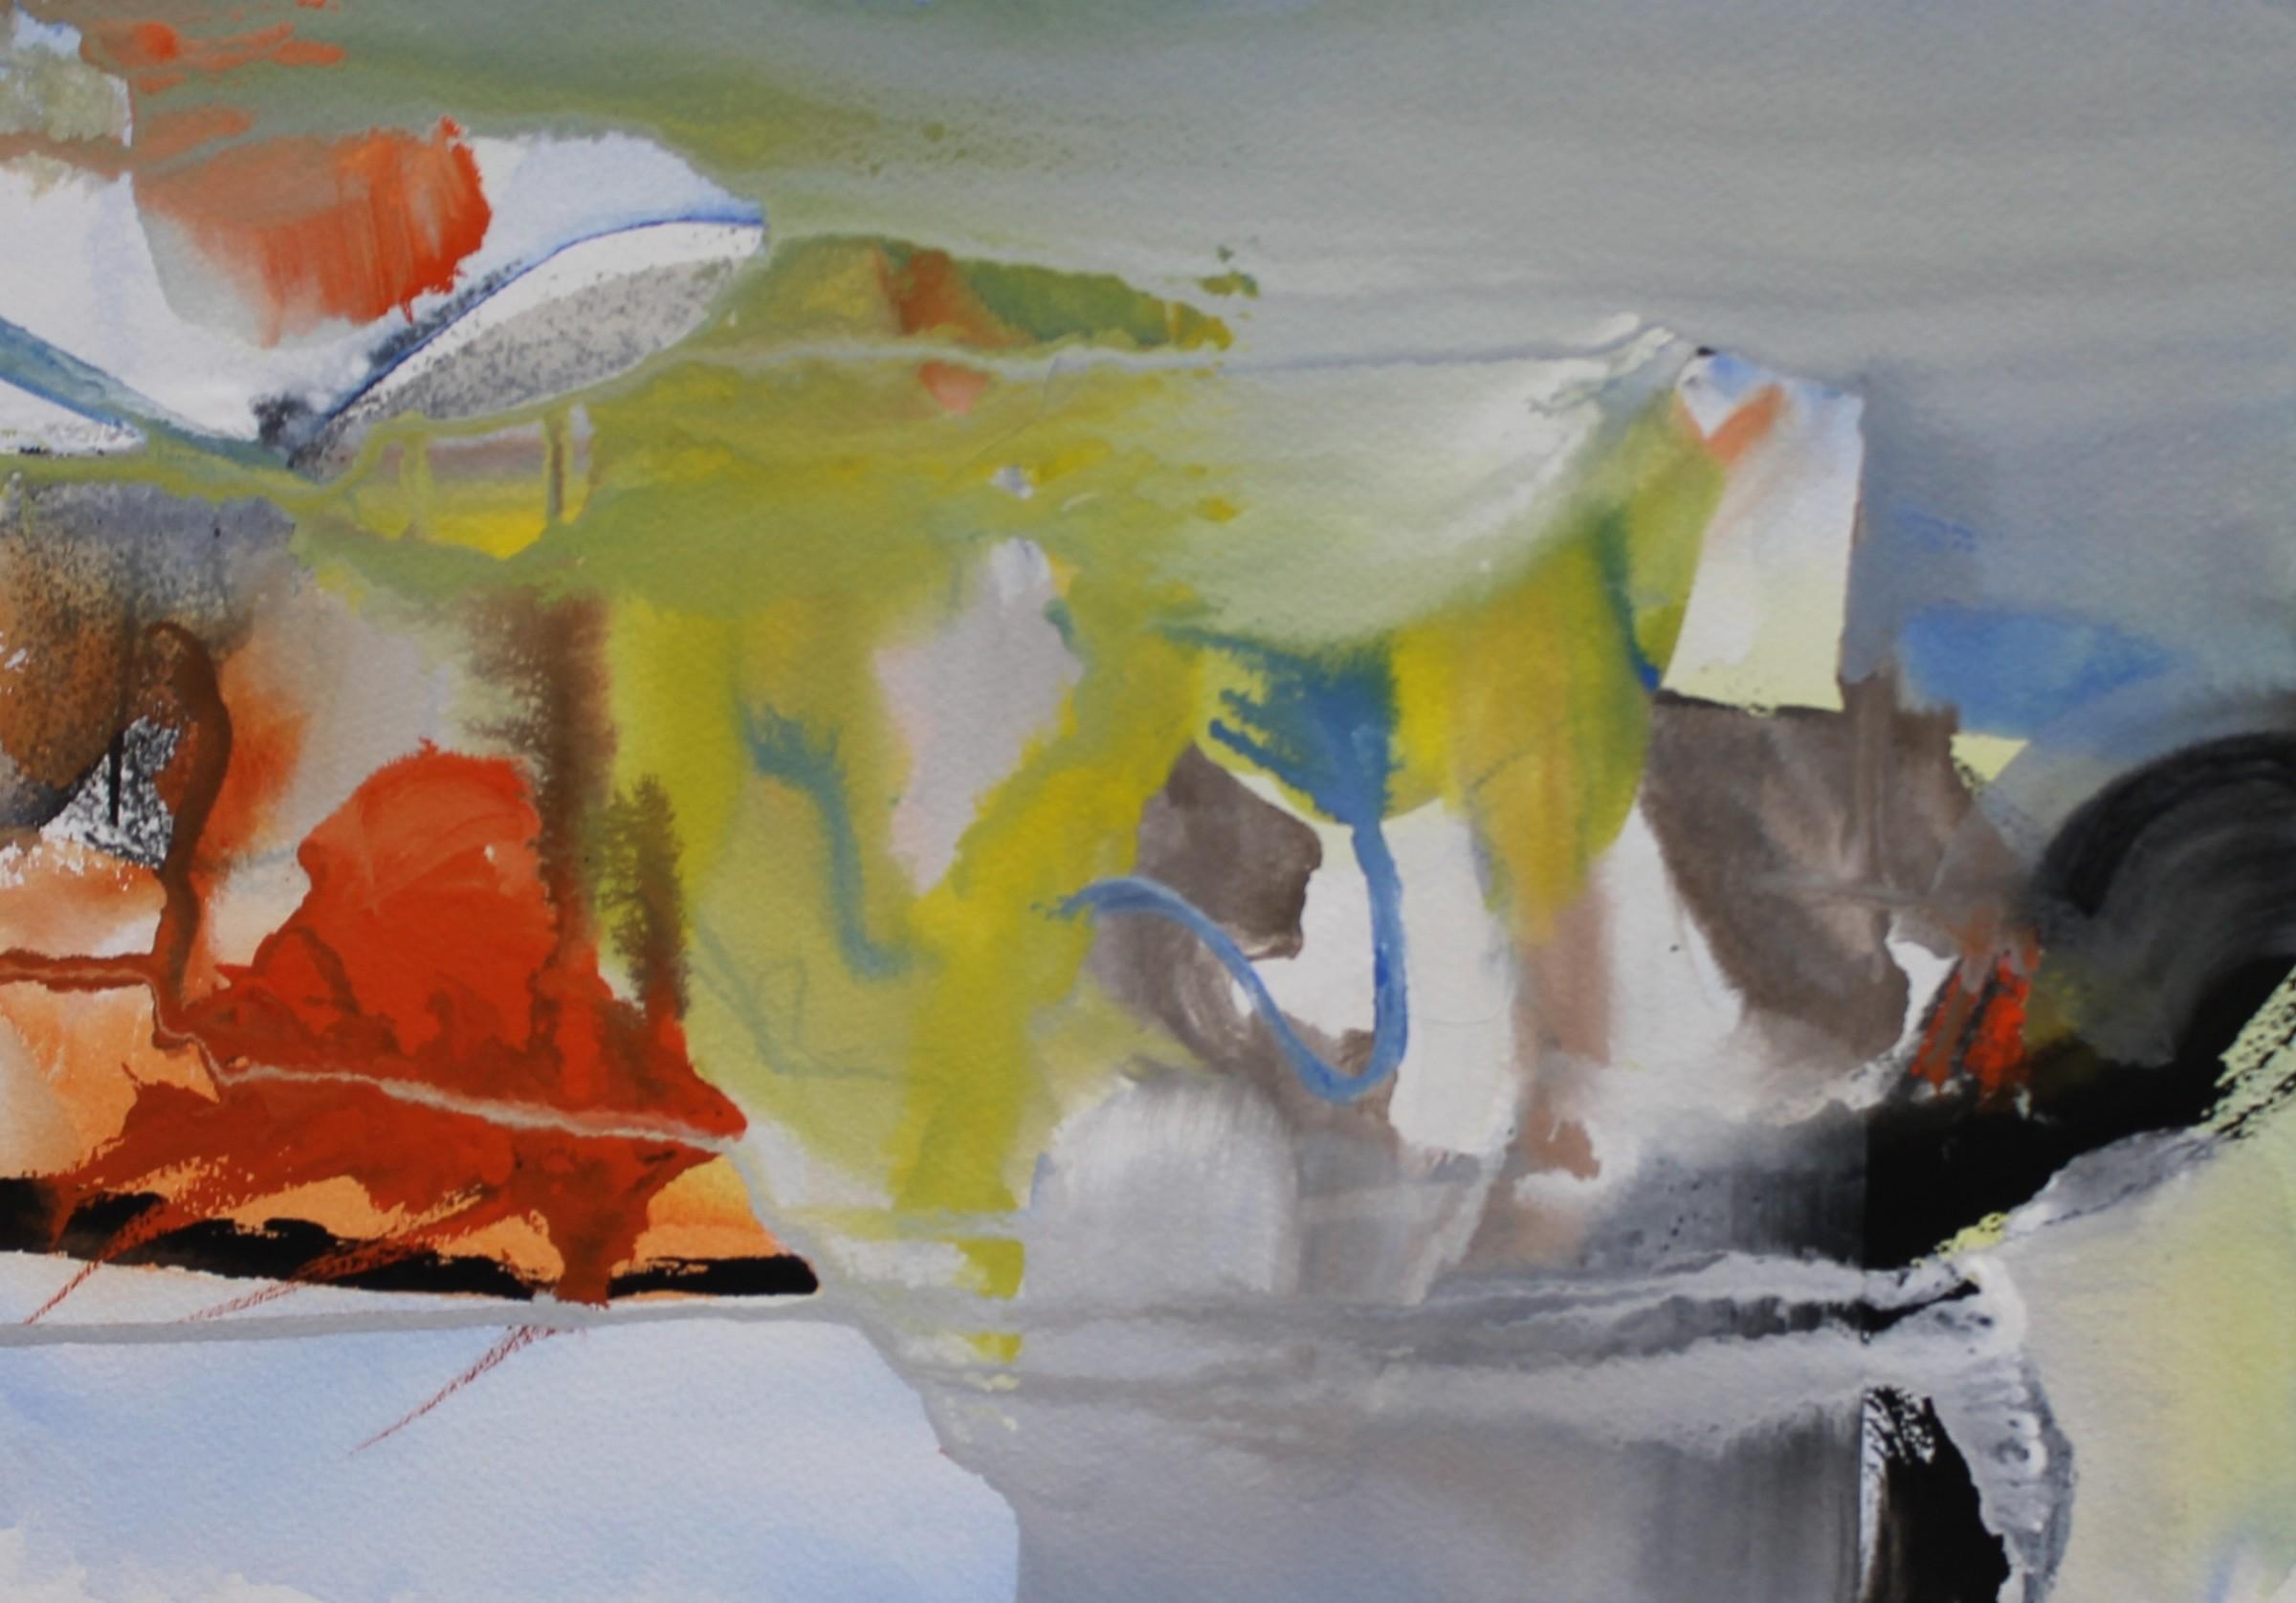 <span class=&#34;link fancybox-details-link&#34;><a href=&#34;/exhibitions/24/works/artworks_standalone10699/&#34;>View Detail Page</a></span><div class=&#34;artist&#34;><span class=&#34;artist&#34;><strong>Julie D. Cooper</strong></span></div><div class=&#34;title&#34;><em>To the Lighthouse</em></div><div class=&#34;medium&#34;>gouache</div><div class=&#34;dimensions&#34;>35 x 45cm</div>